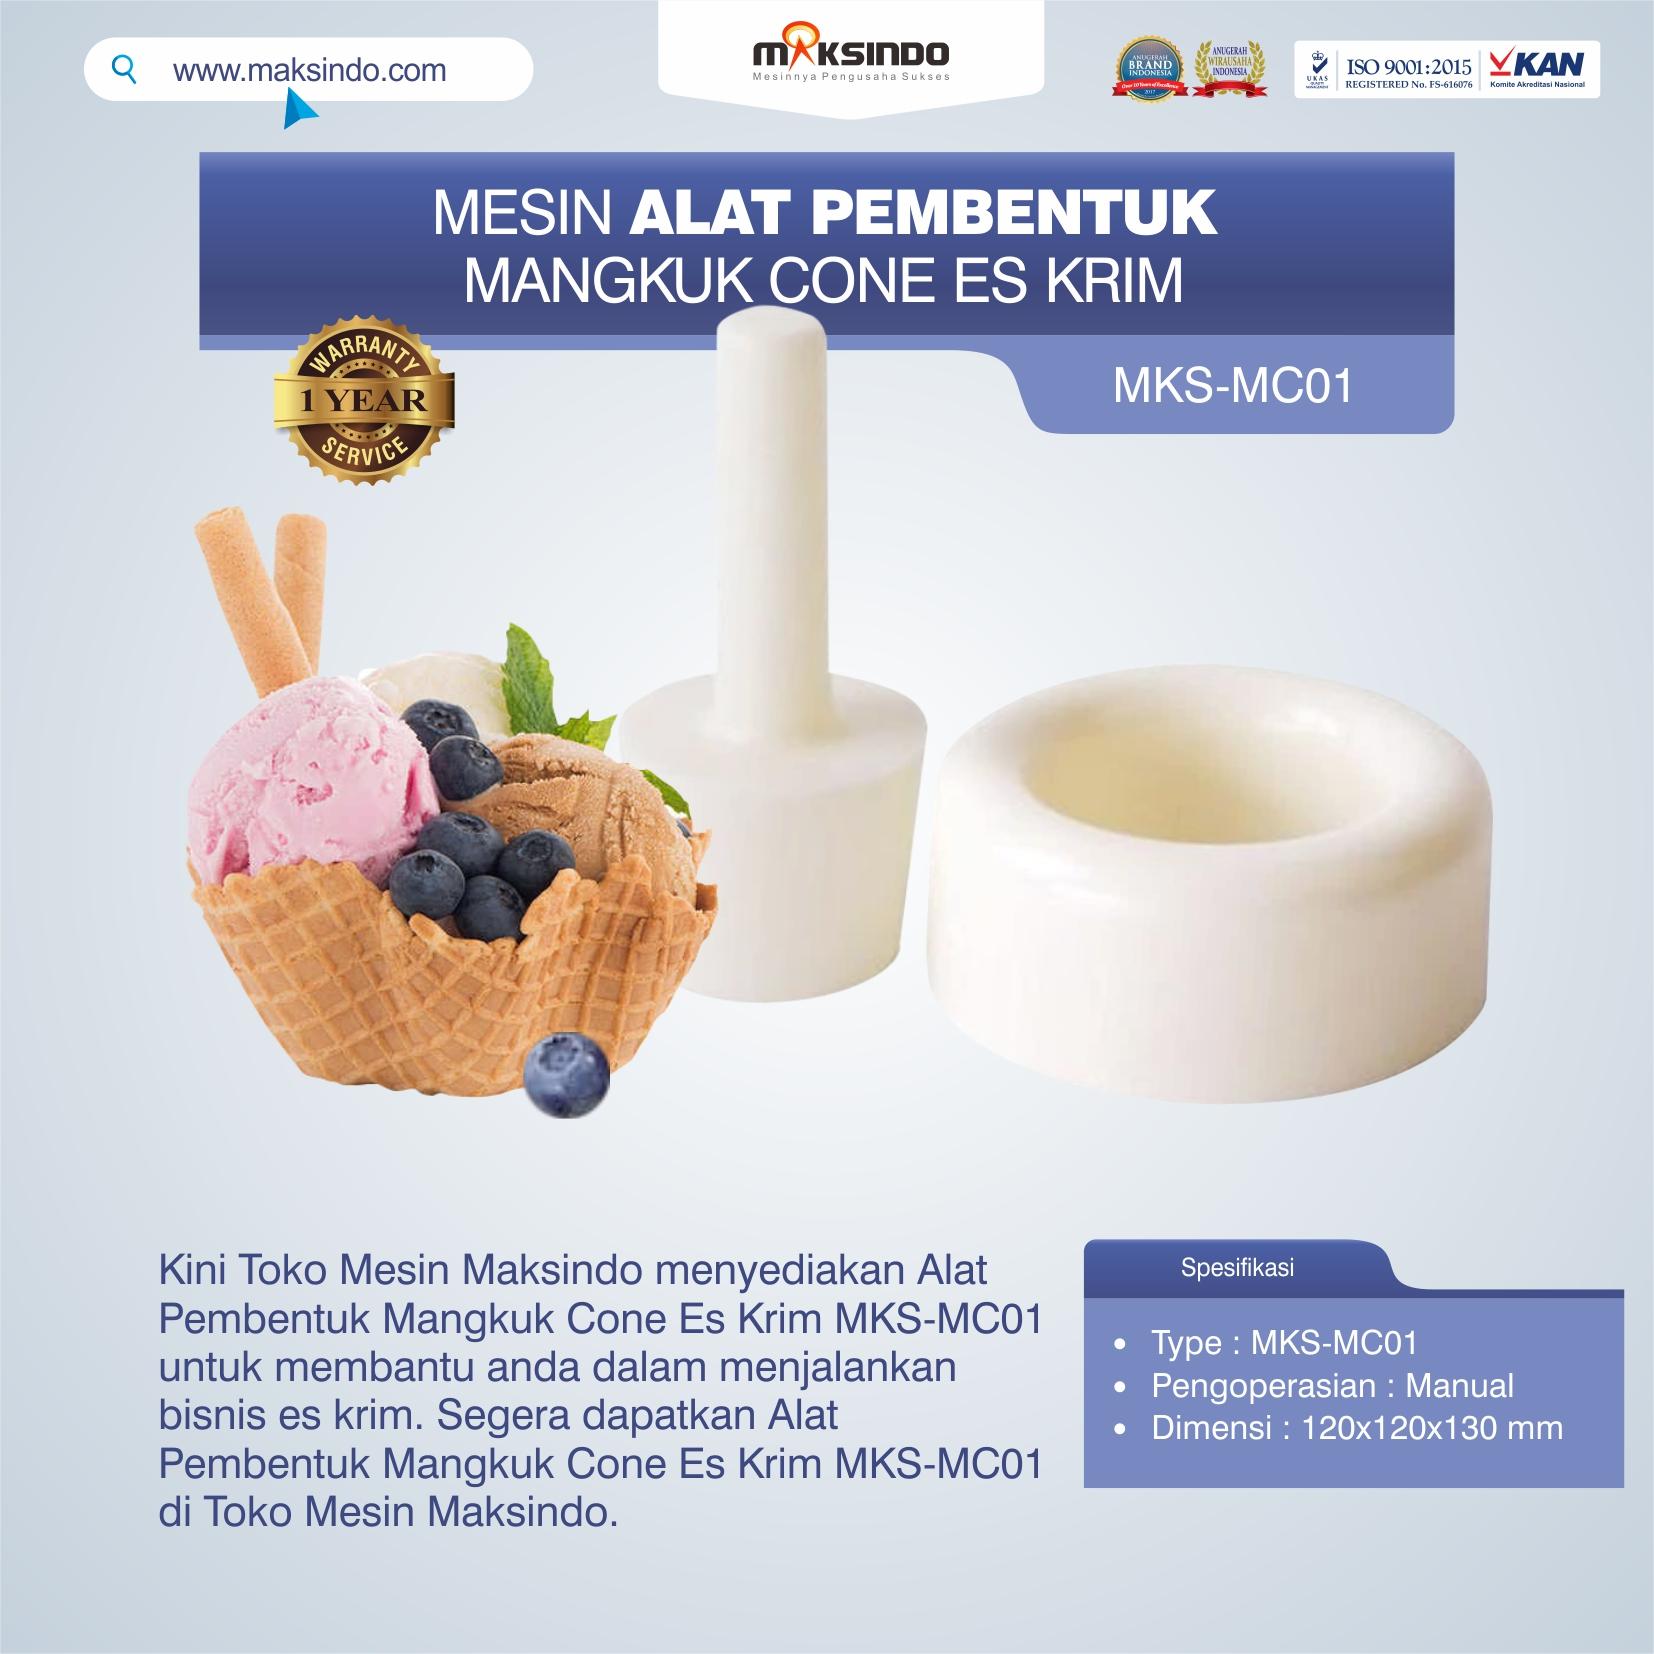 Jual Alat Pembentuk Mangkuk Cone Es Krim MKS-MC01 di Solo